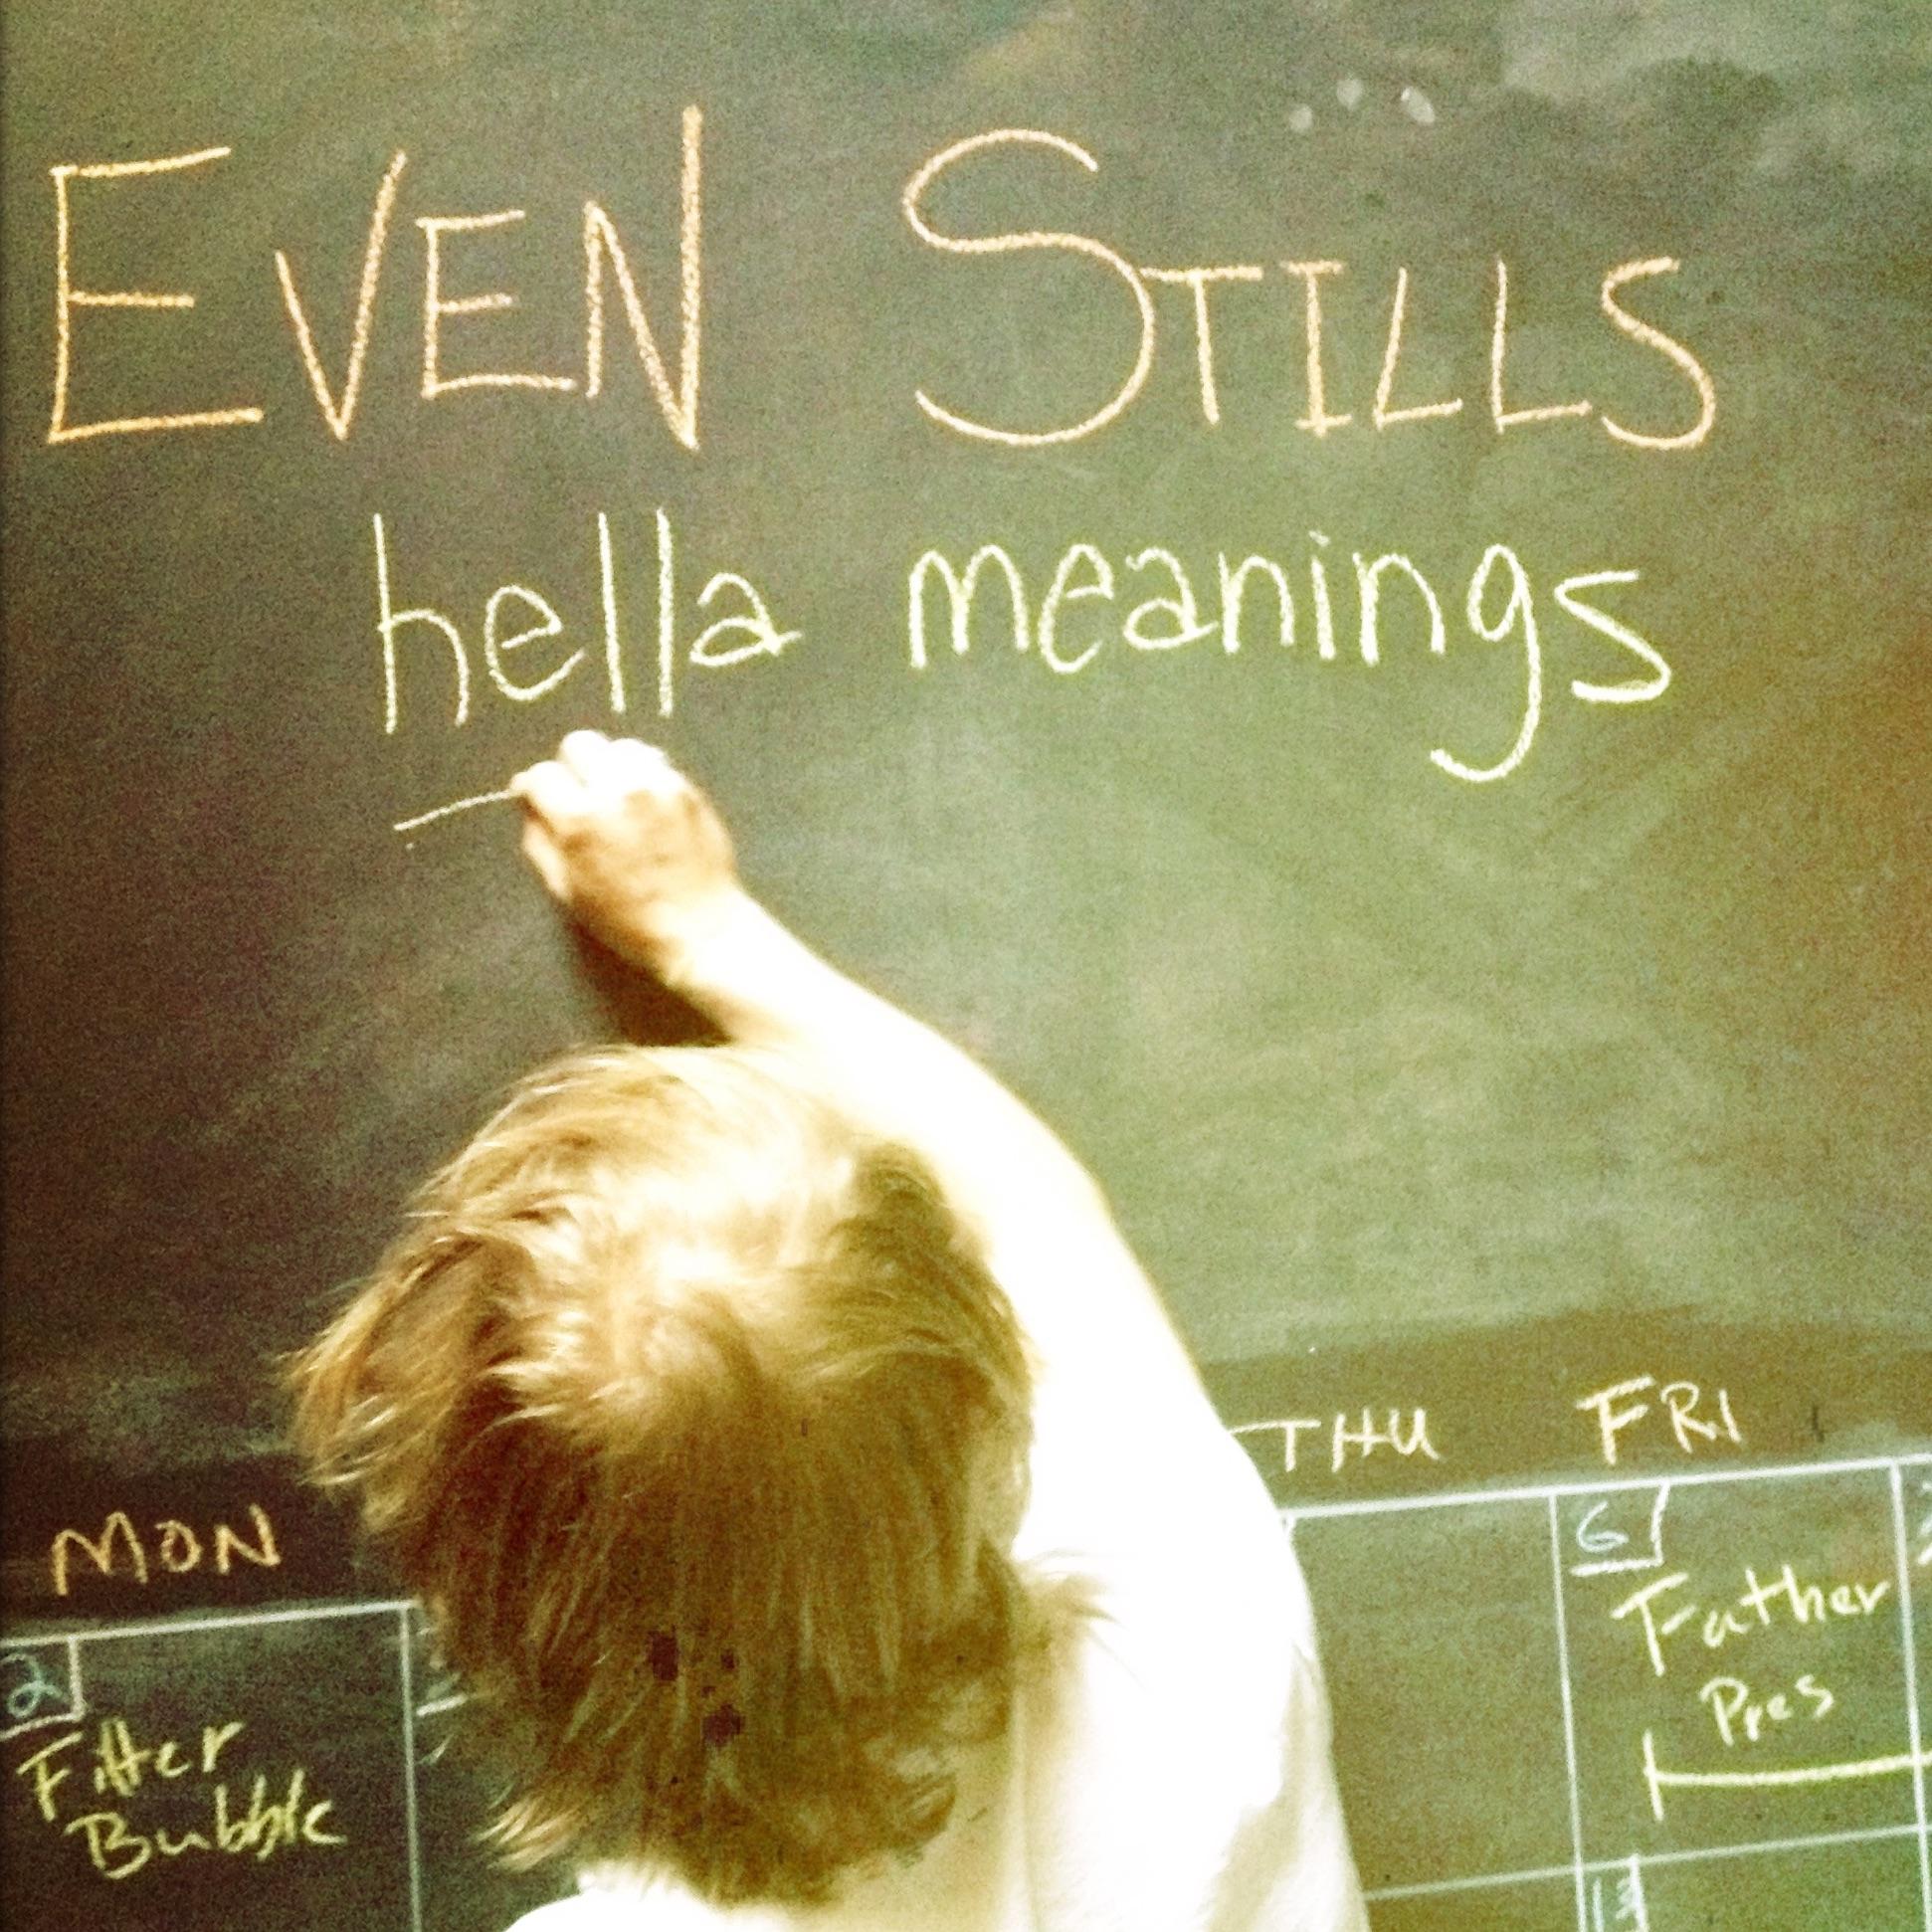 Hella Meanings